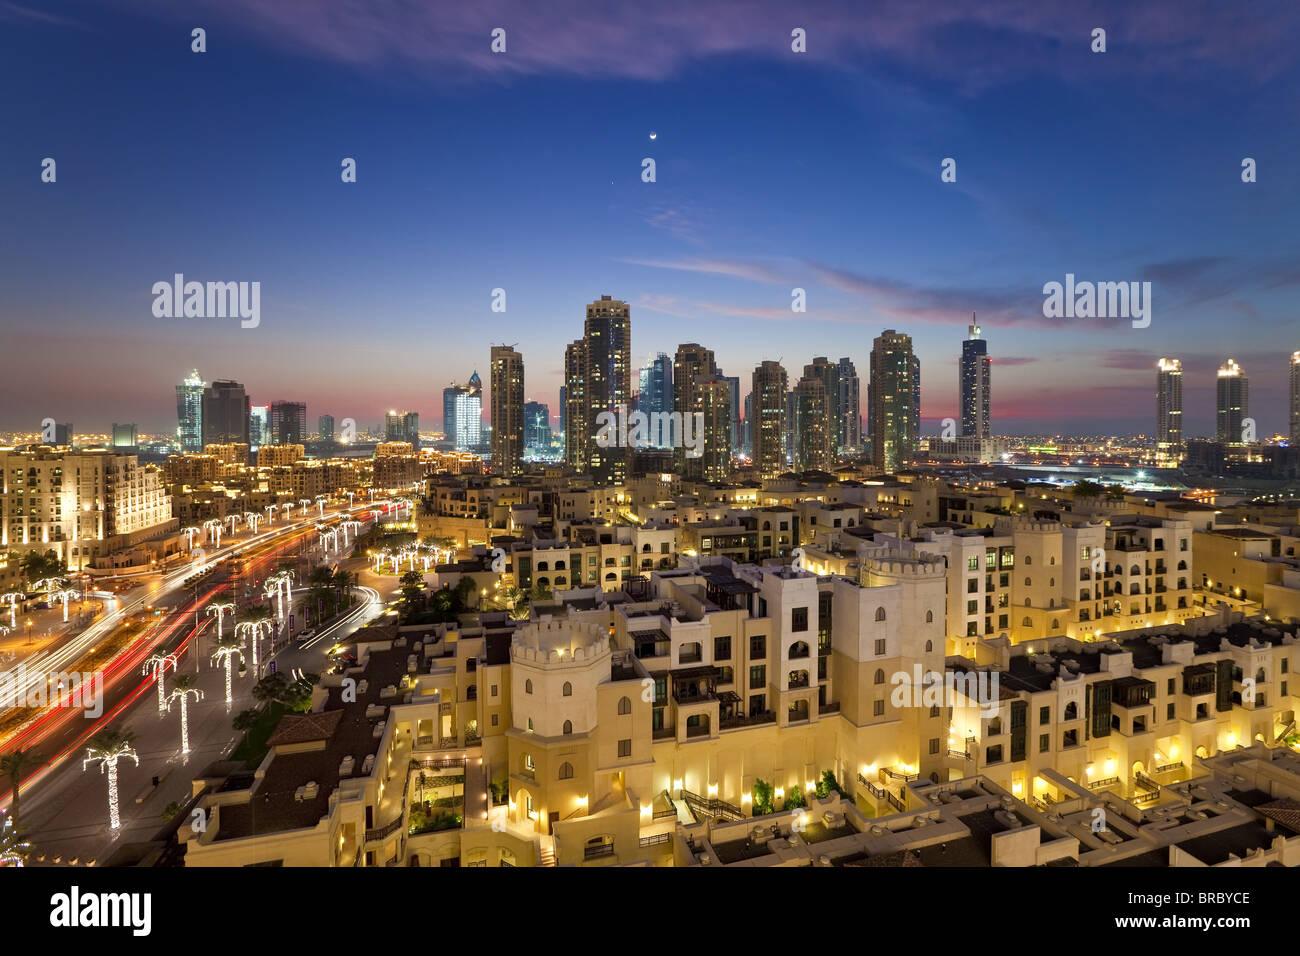 The Palace Hotel in the grounds of the Burj Khalifa park viewed towards the high rises of Dubai Marina area, Dubai, - Stock Image